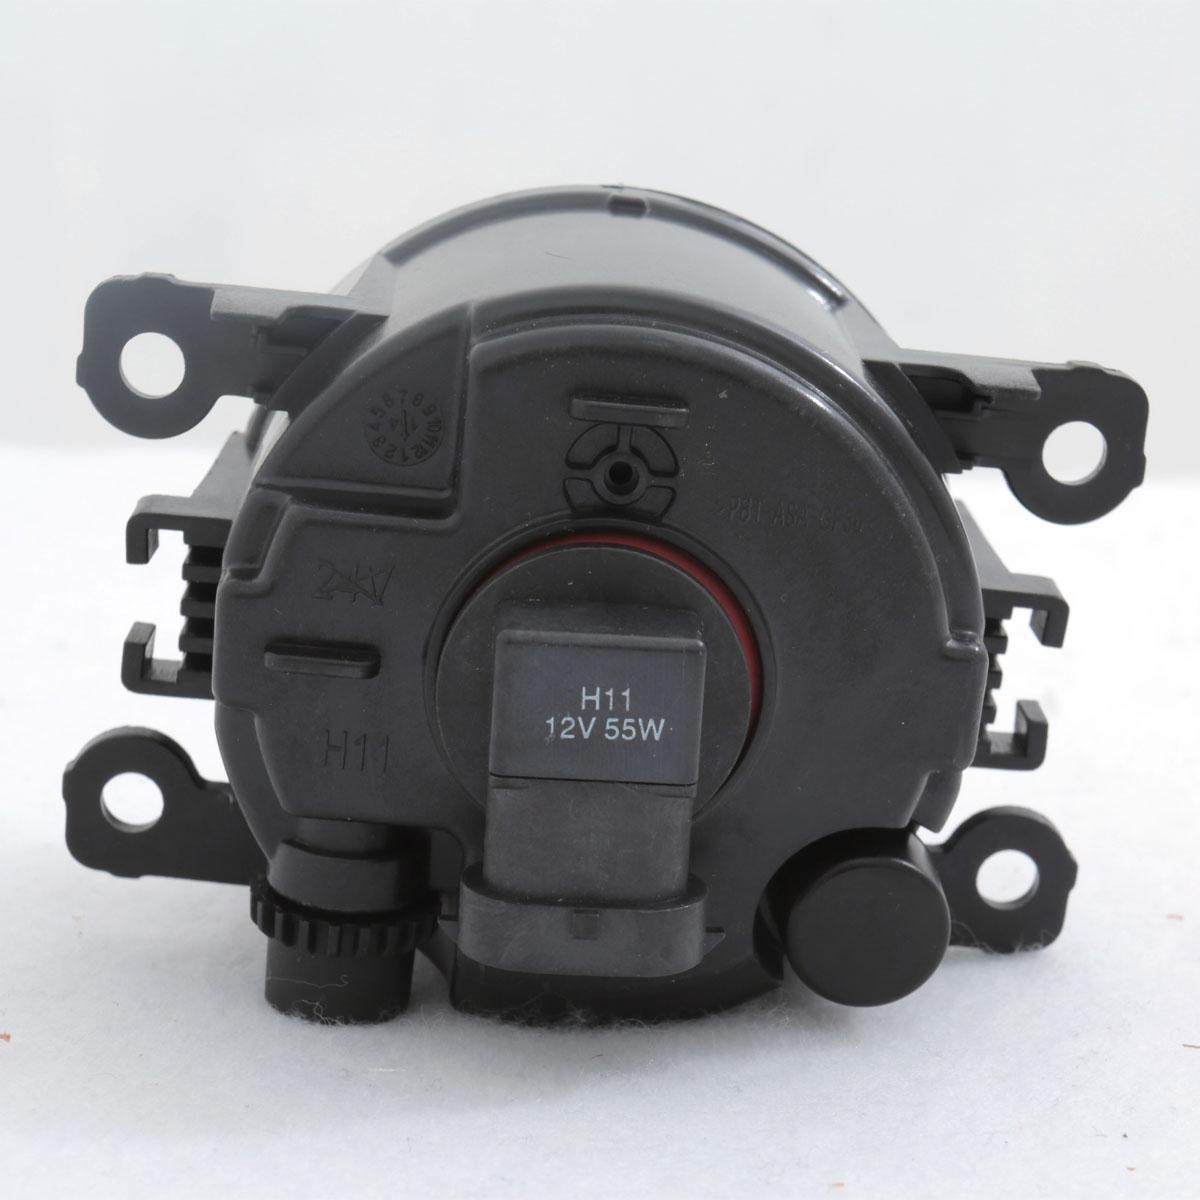 2006 2014 Suzuki Grand Vitara Glass Lens Fog Lights Wiring Harness Switch Set